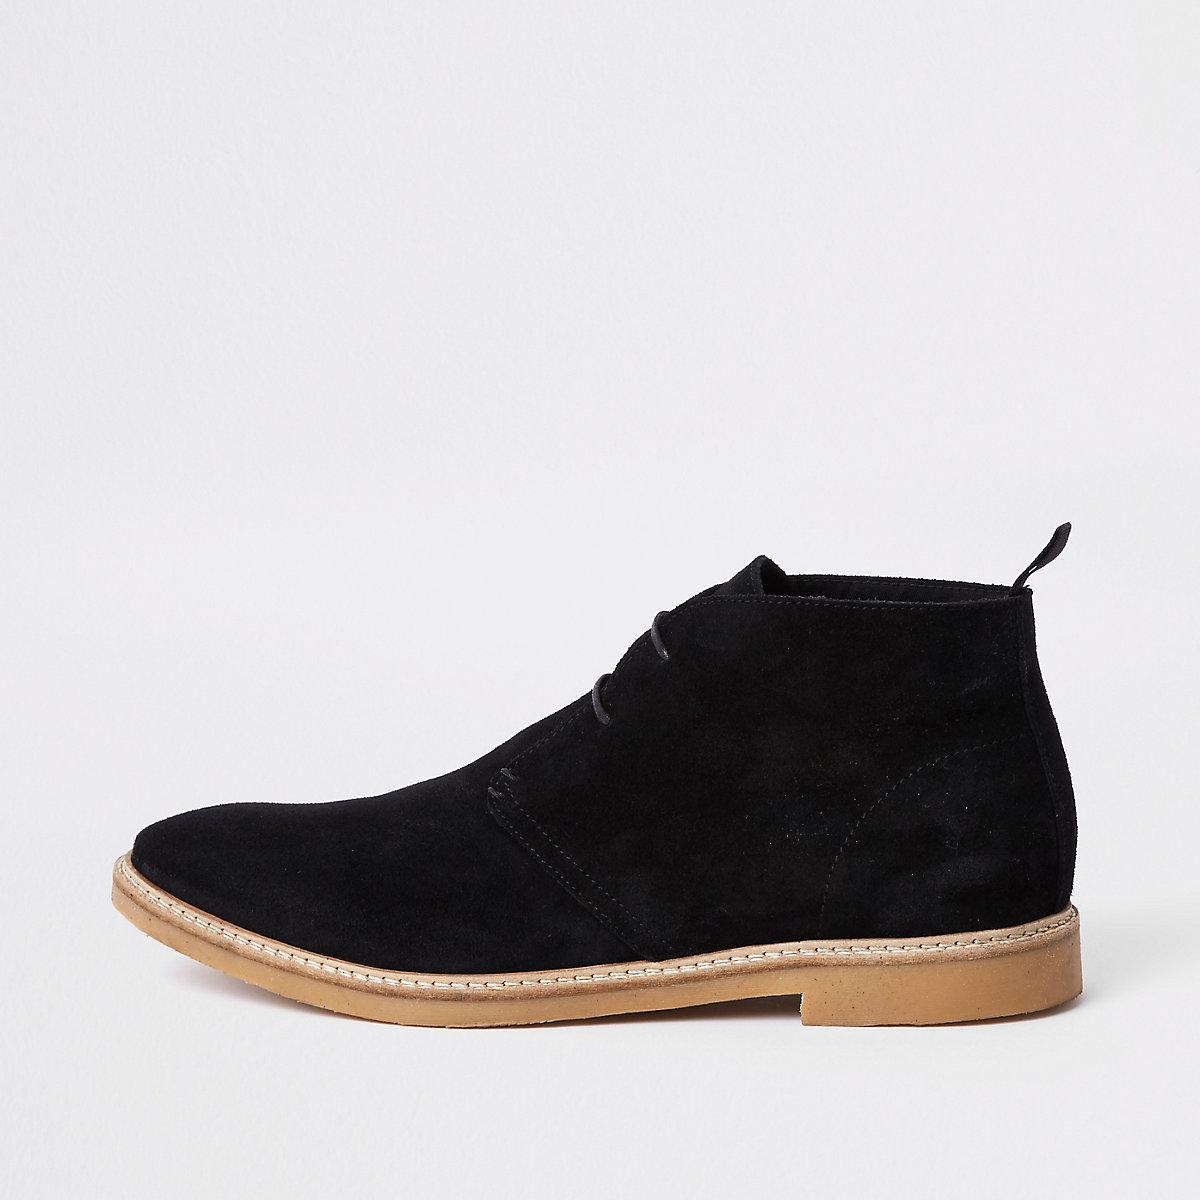 Black suede eyelet desert boots